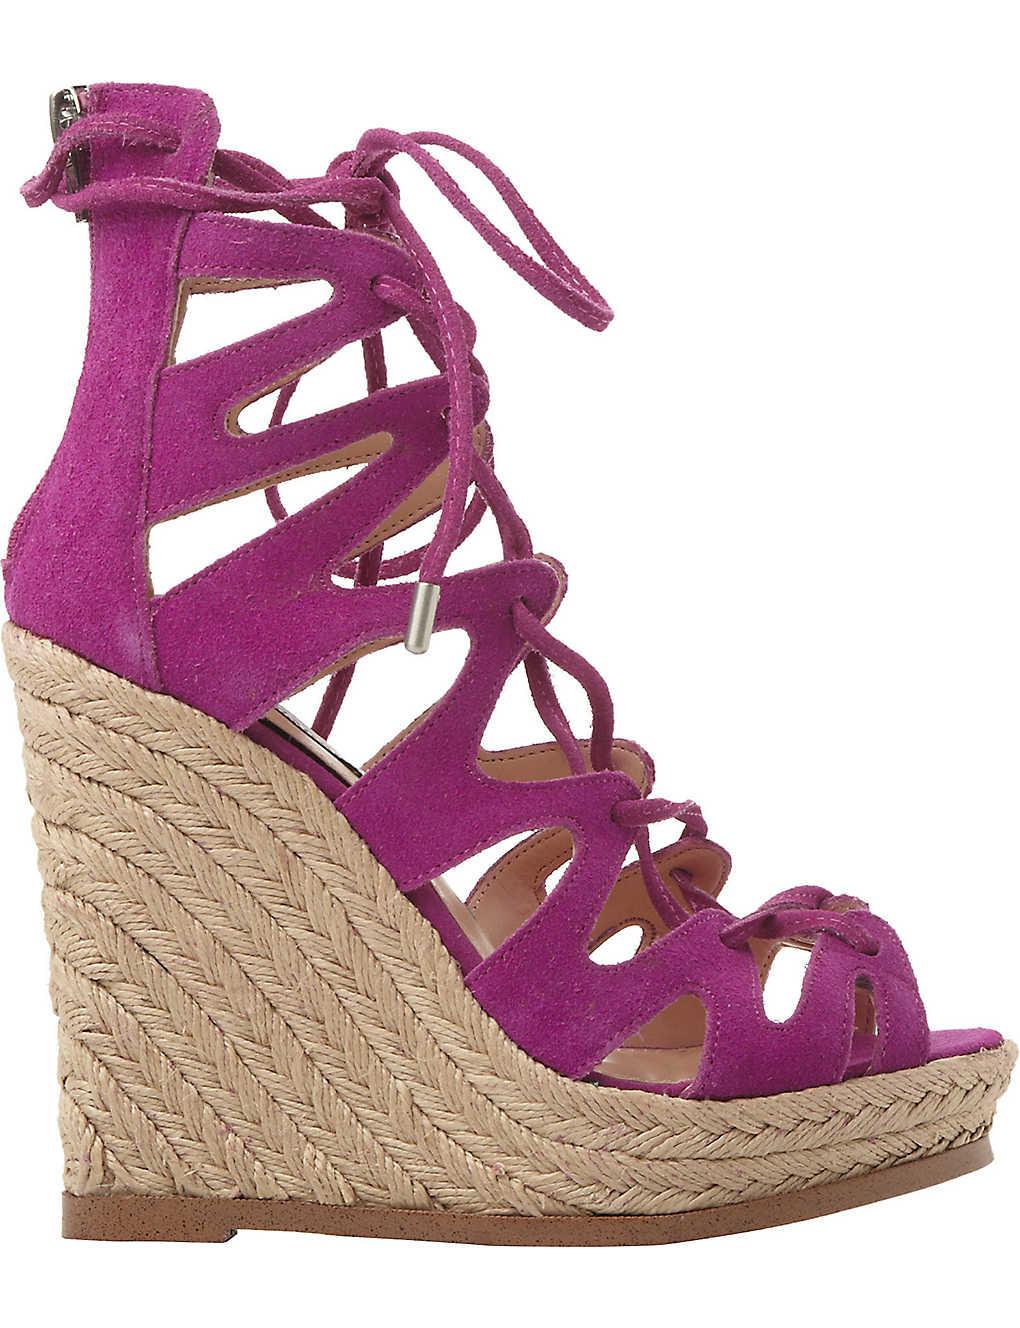 44bf054ffe STEVE MADDEN - Ghille lace-up wedge sandals   Selfridges.com